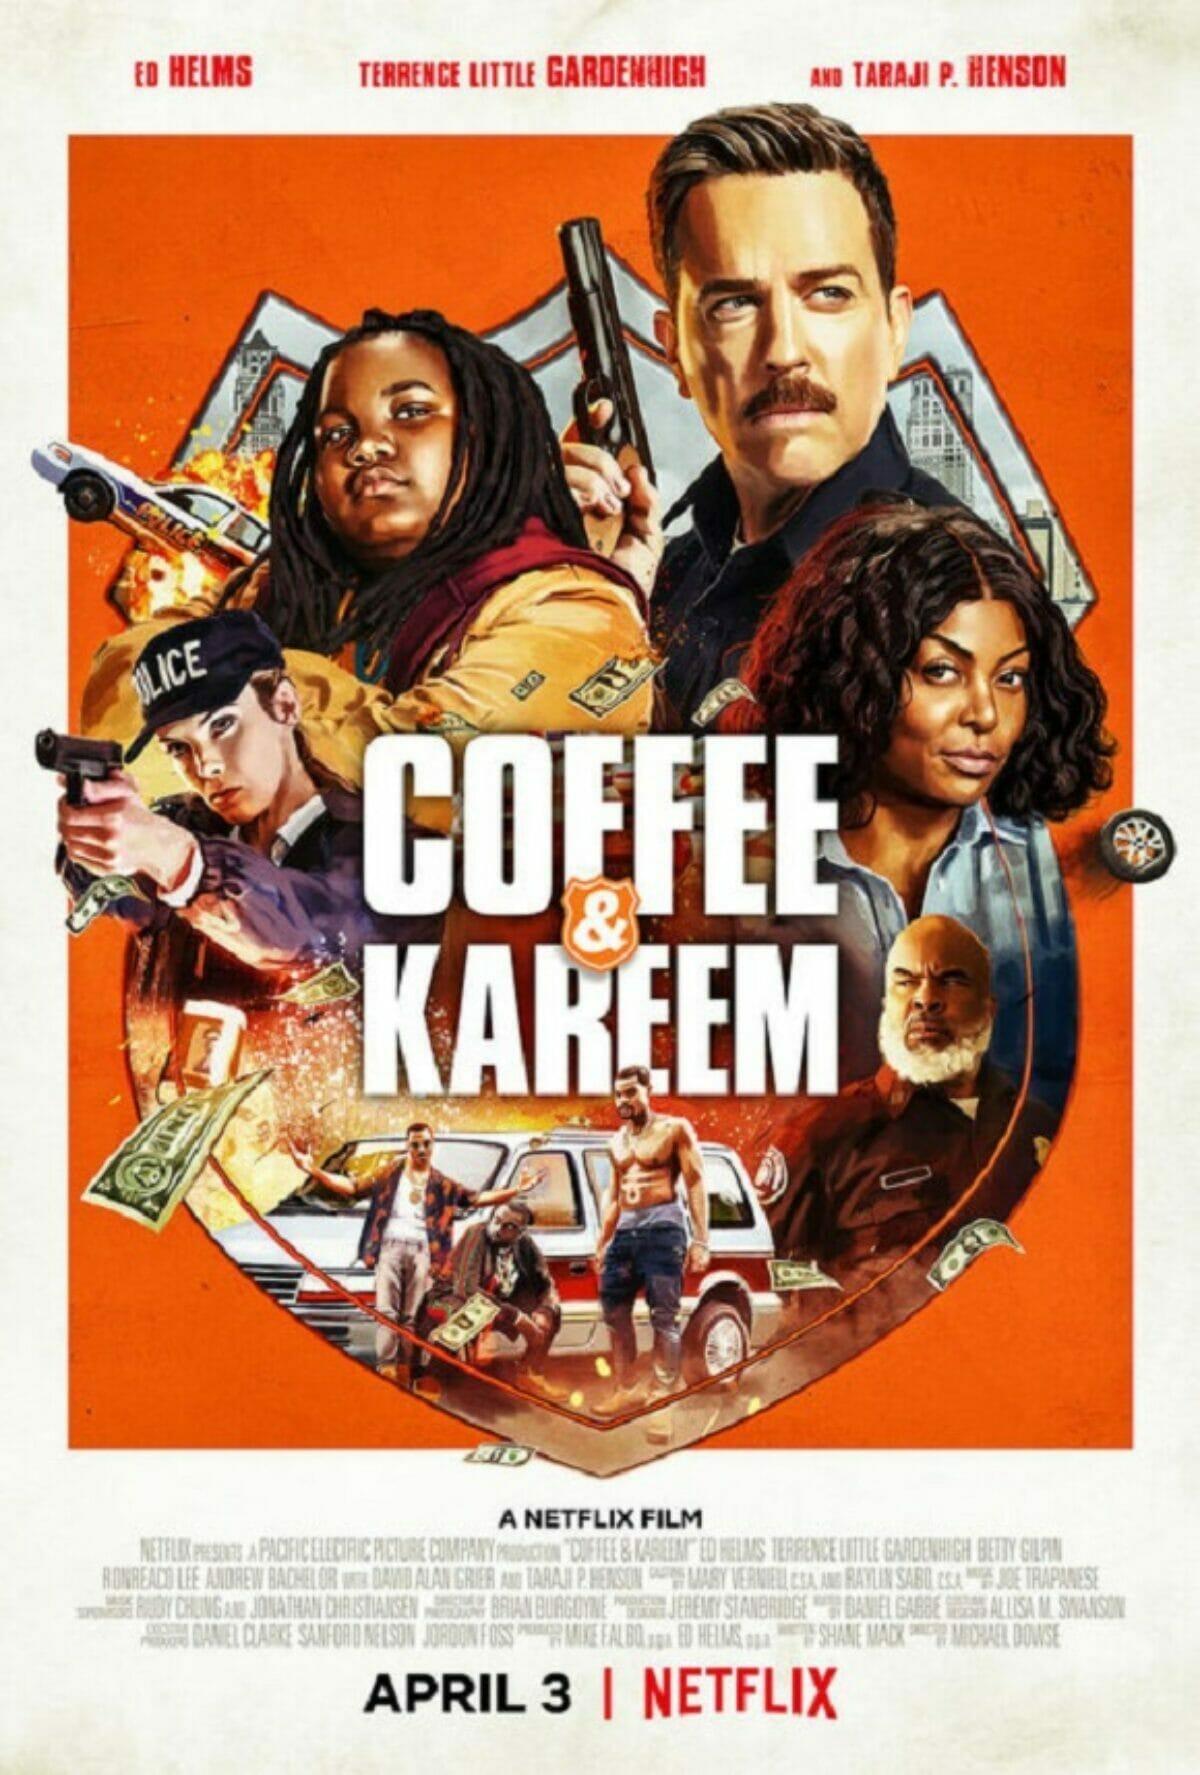 Coffee-&-Kareem-poster